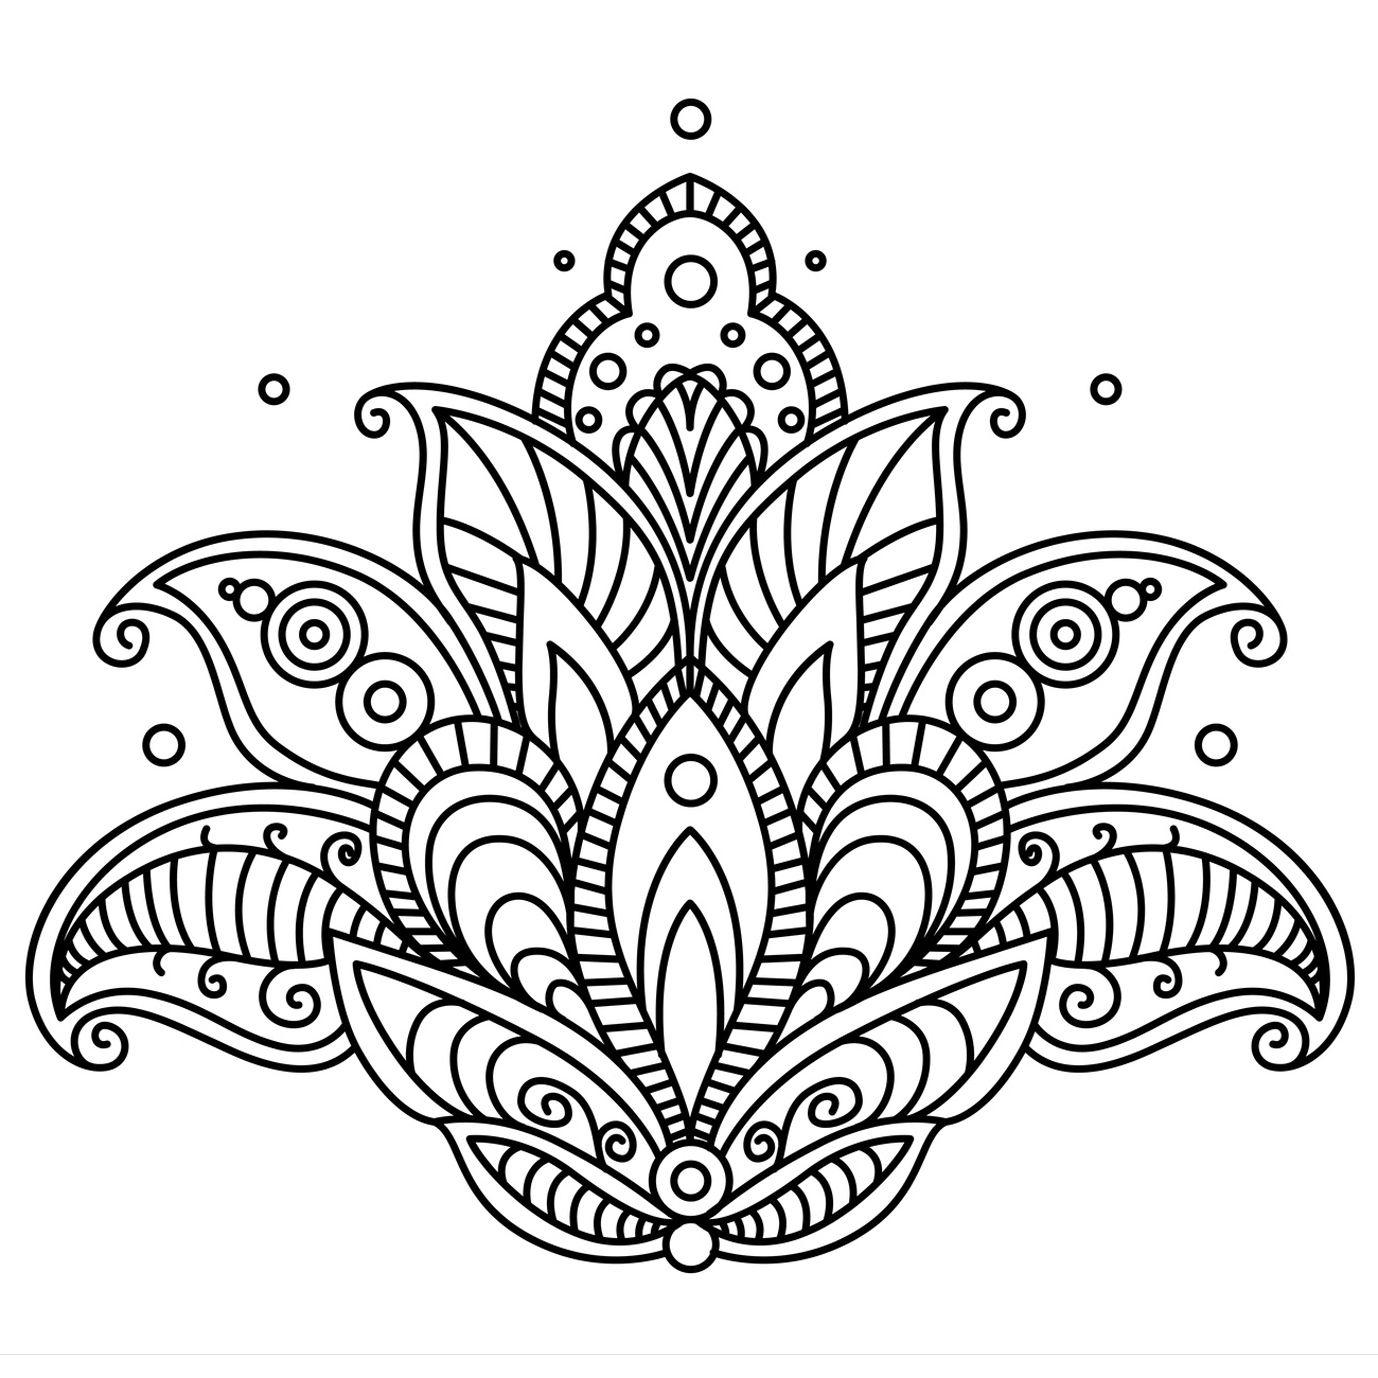 Mandala, Coloriage Mandala En Ligne | Coloriage Mandala encequiconcerne Coloriage Mandala Adulte A Imprimer